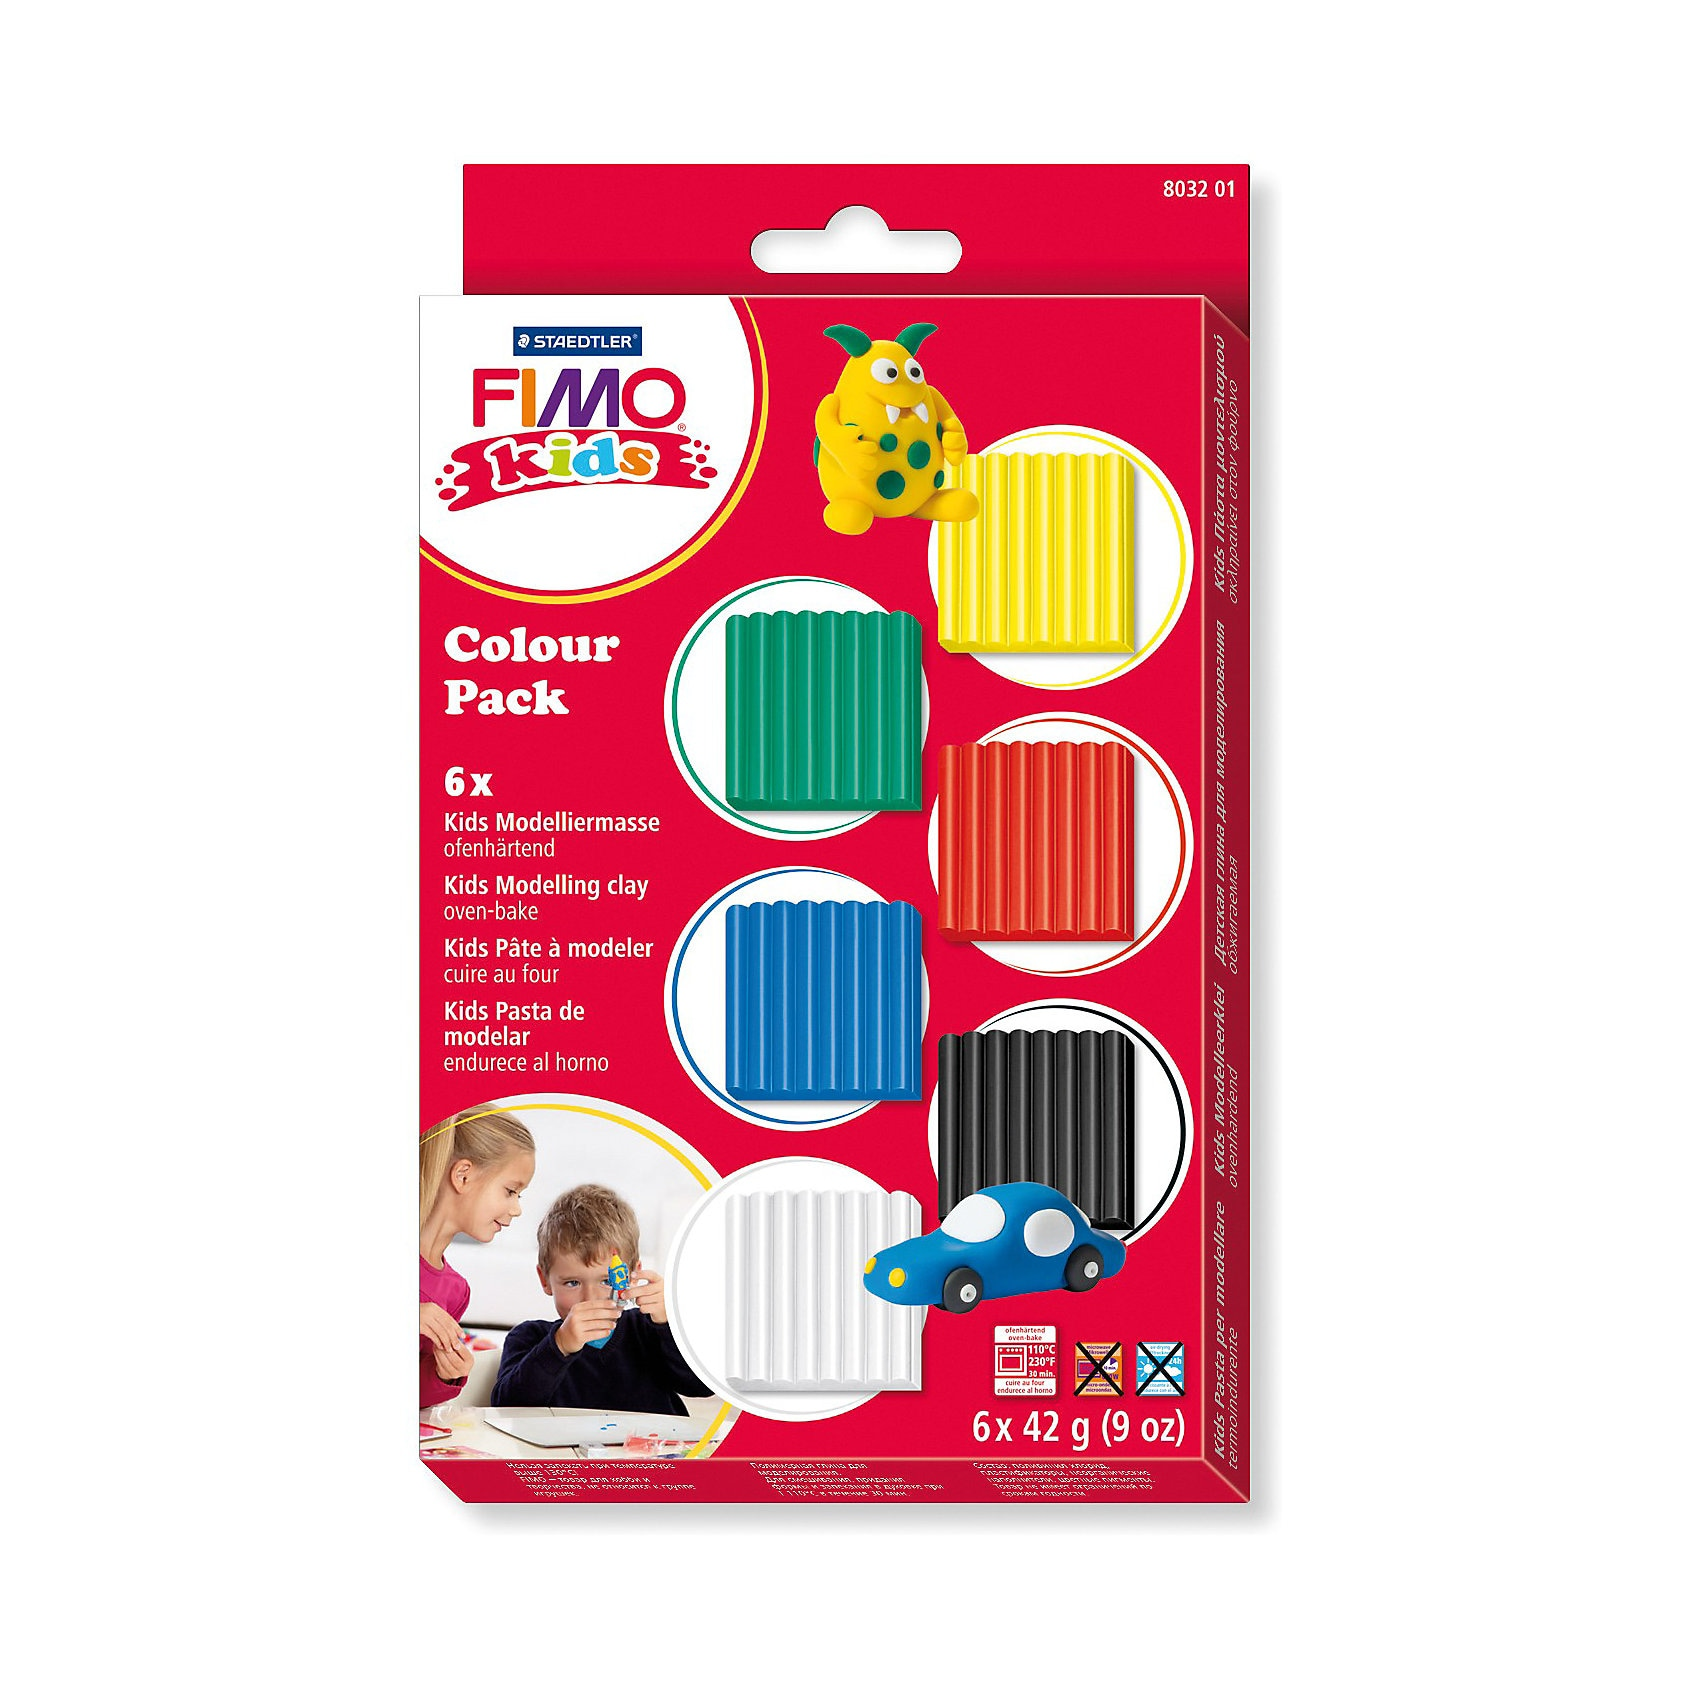 Staedtler Fimo kids Materialpackung basic 6 x 42 g